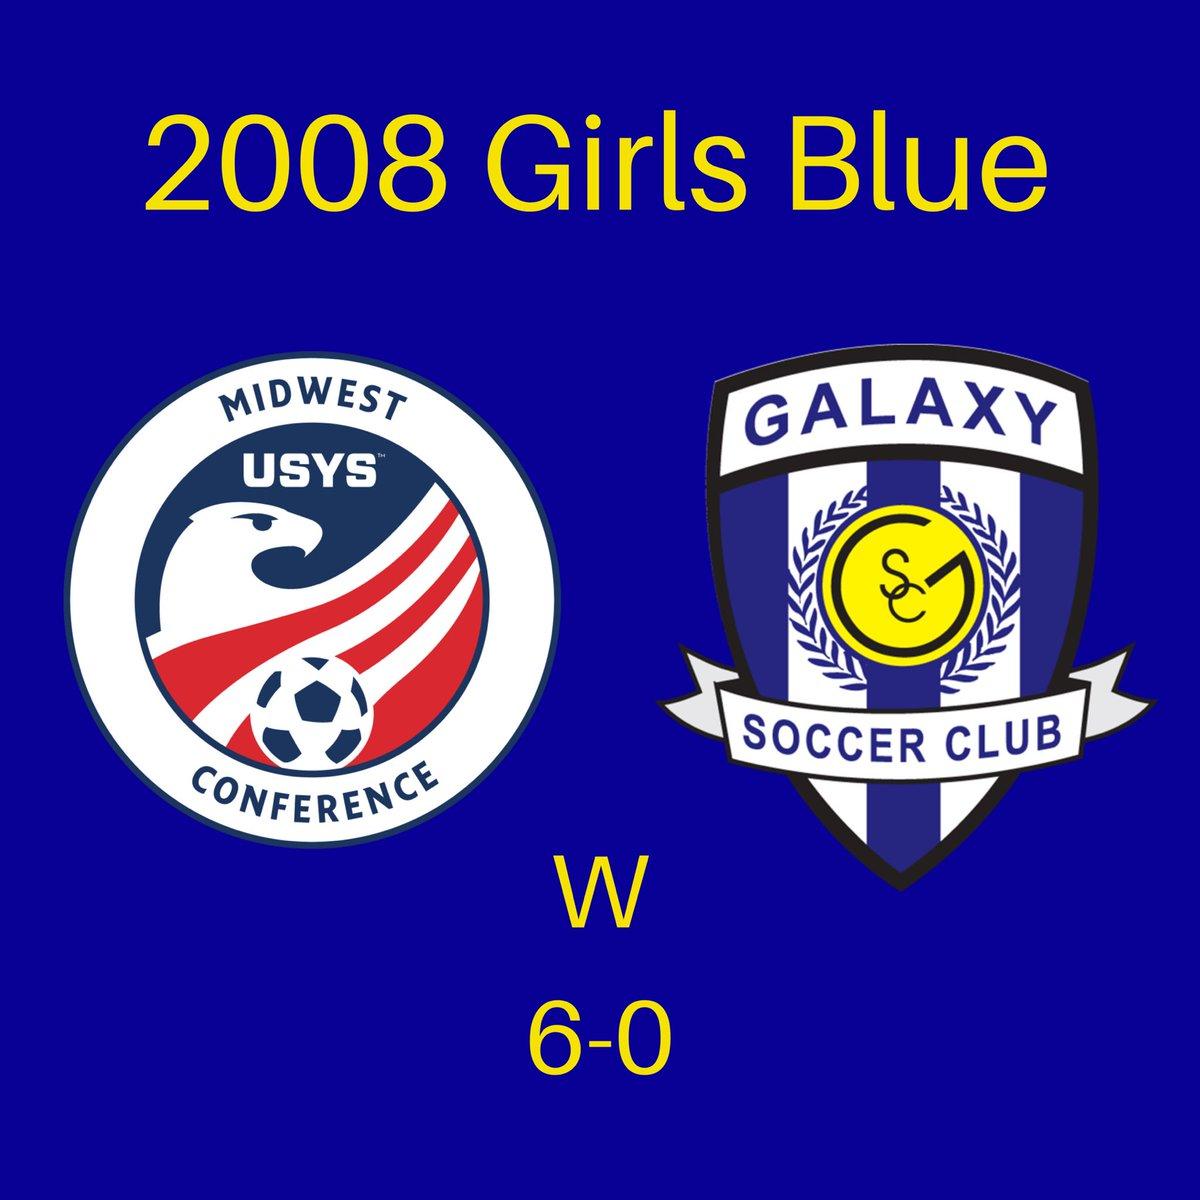 Galaxy Soccer Club (@GalaxySCIL) | Twitter